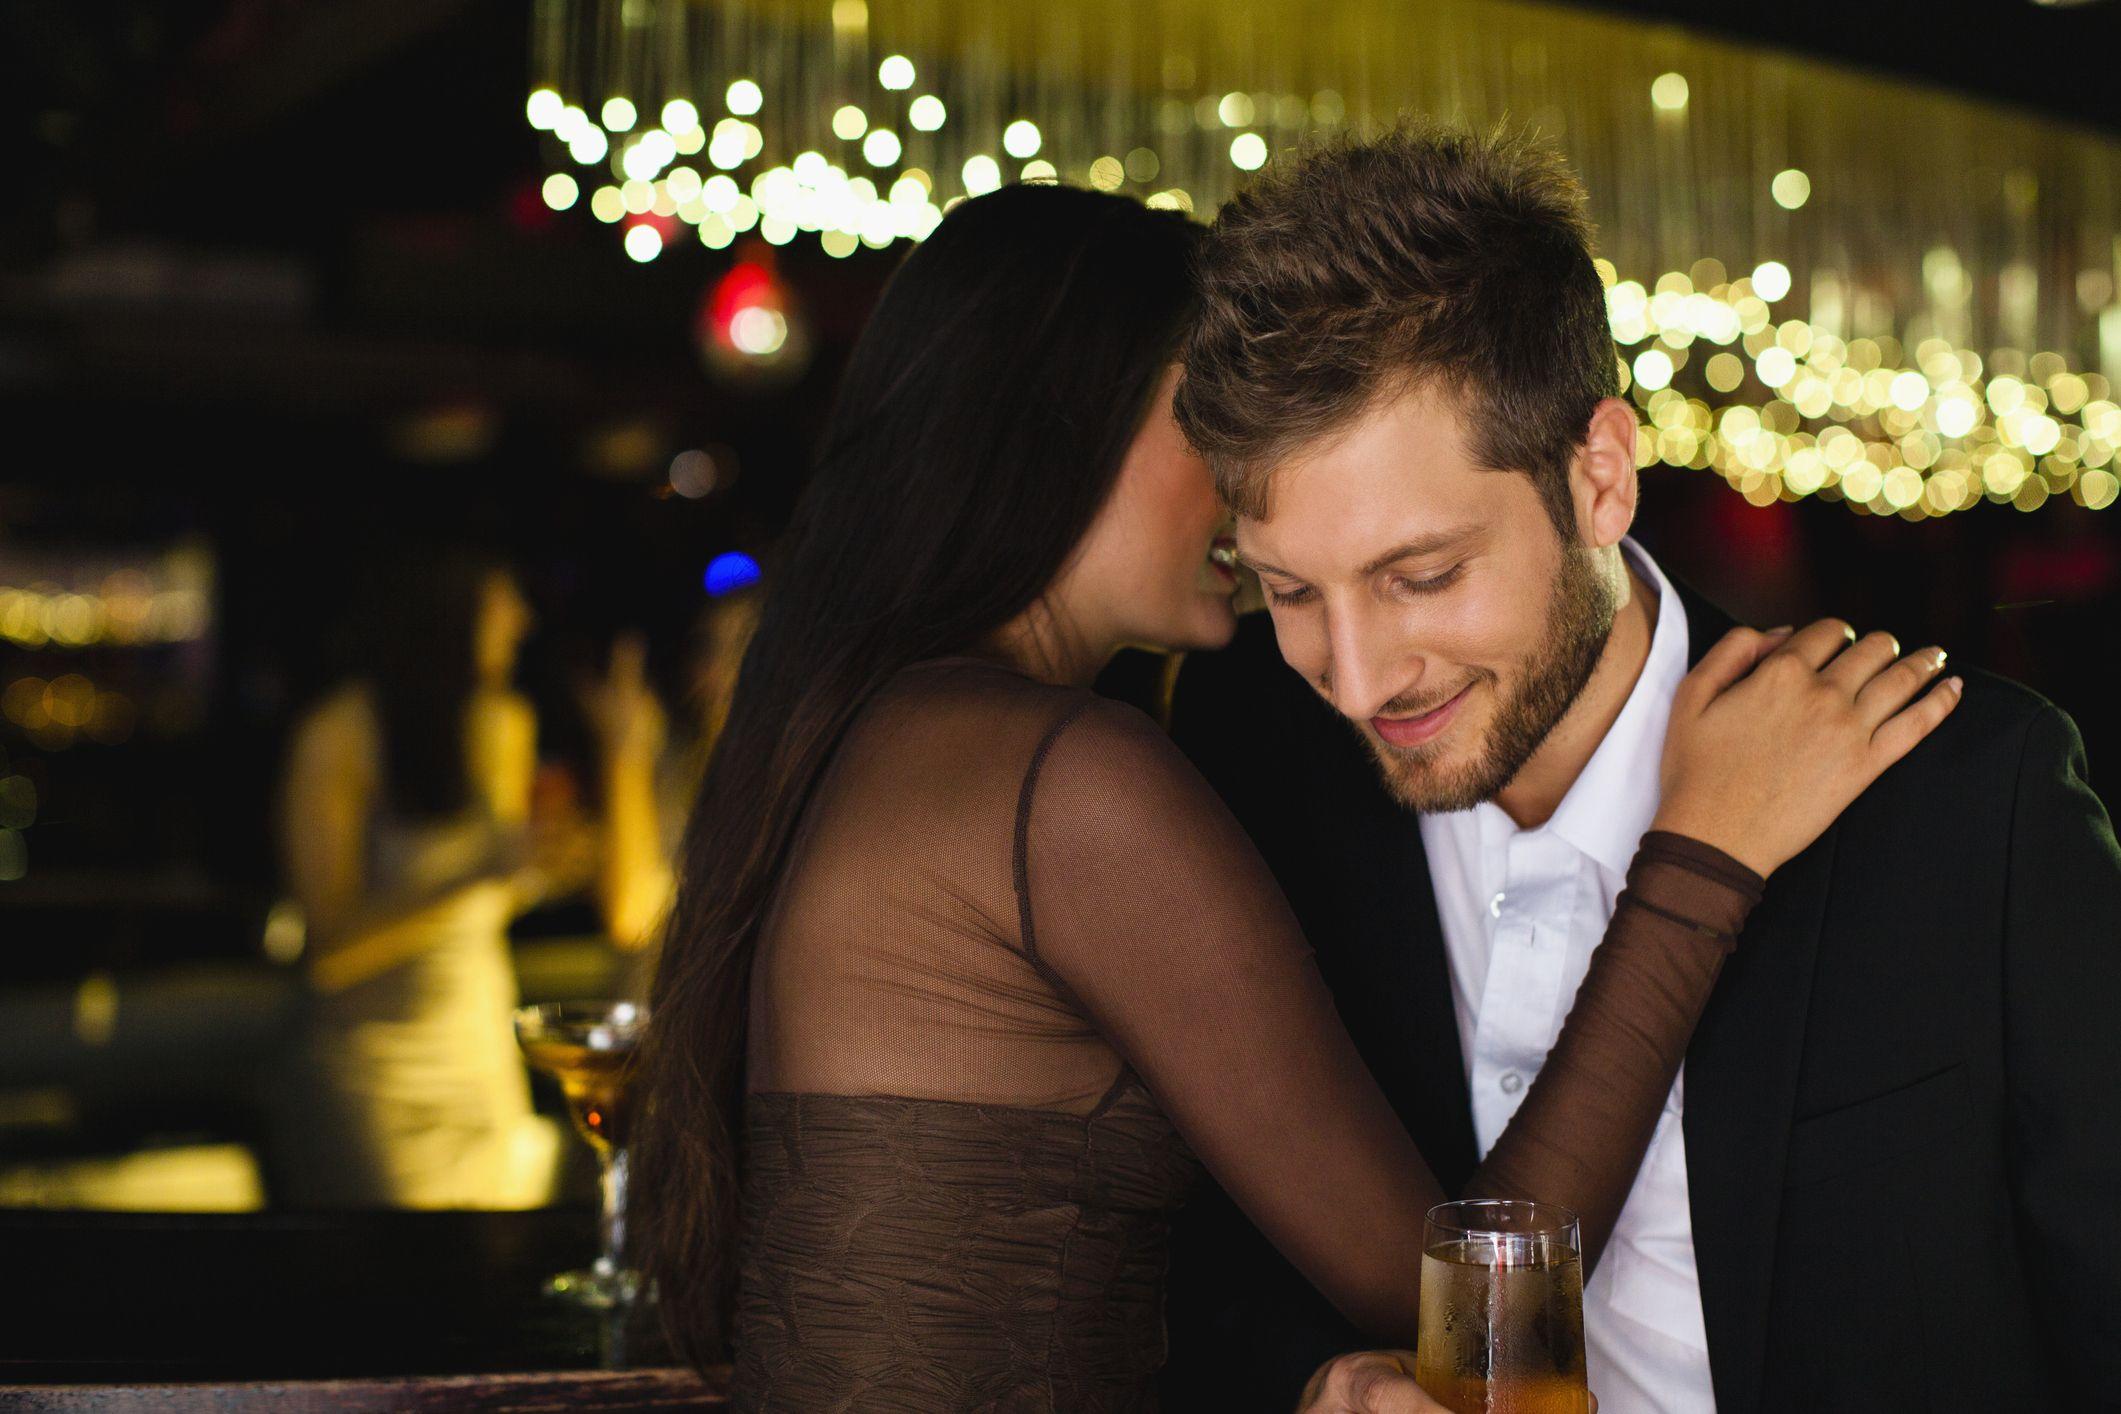 flirting vs cheating infidelity movie trailer video games